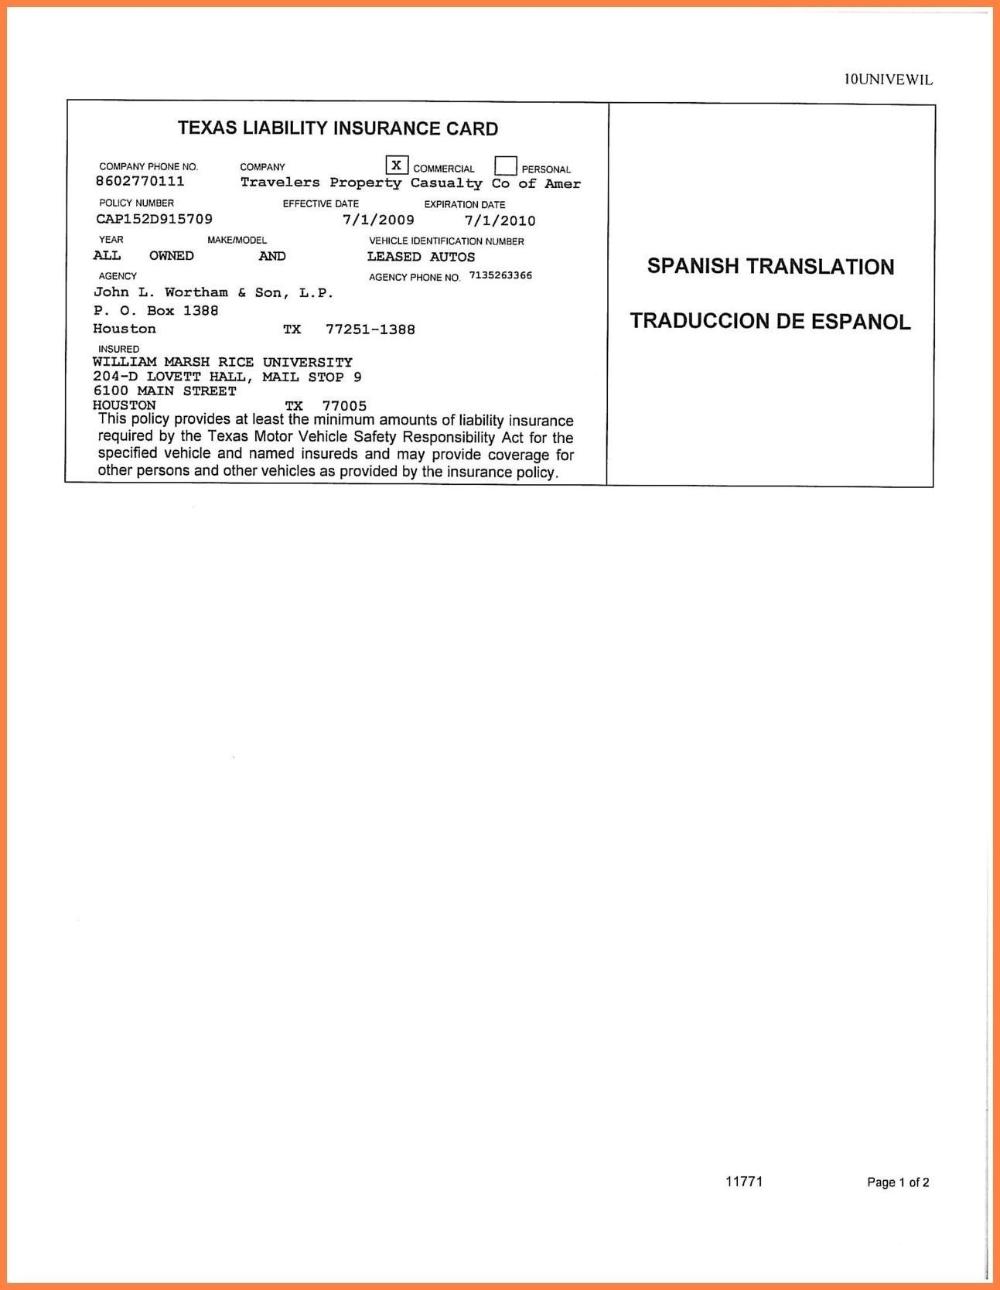 Car Insurance Card Template Free Auto Insurance Card Template Free Inside Fake Auto Insurance Card Template Download In 2020 Card Templates Free Id Card Template Templates Free Download